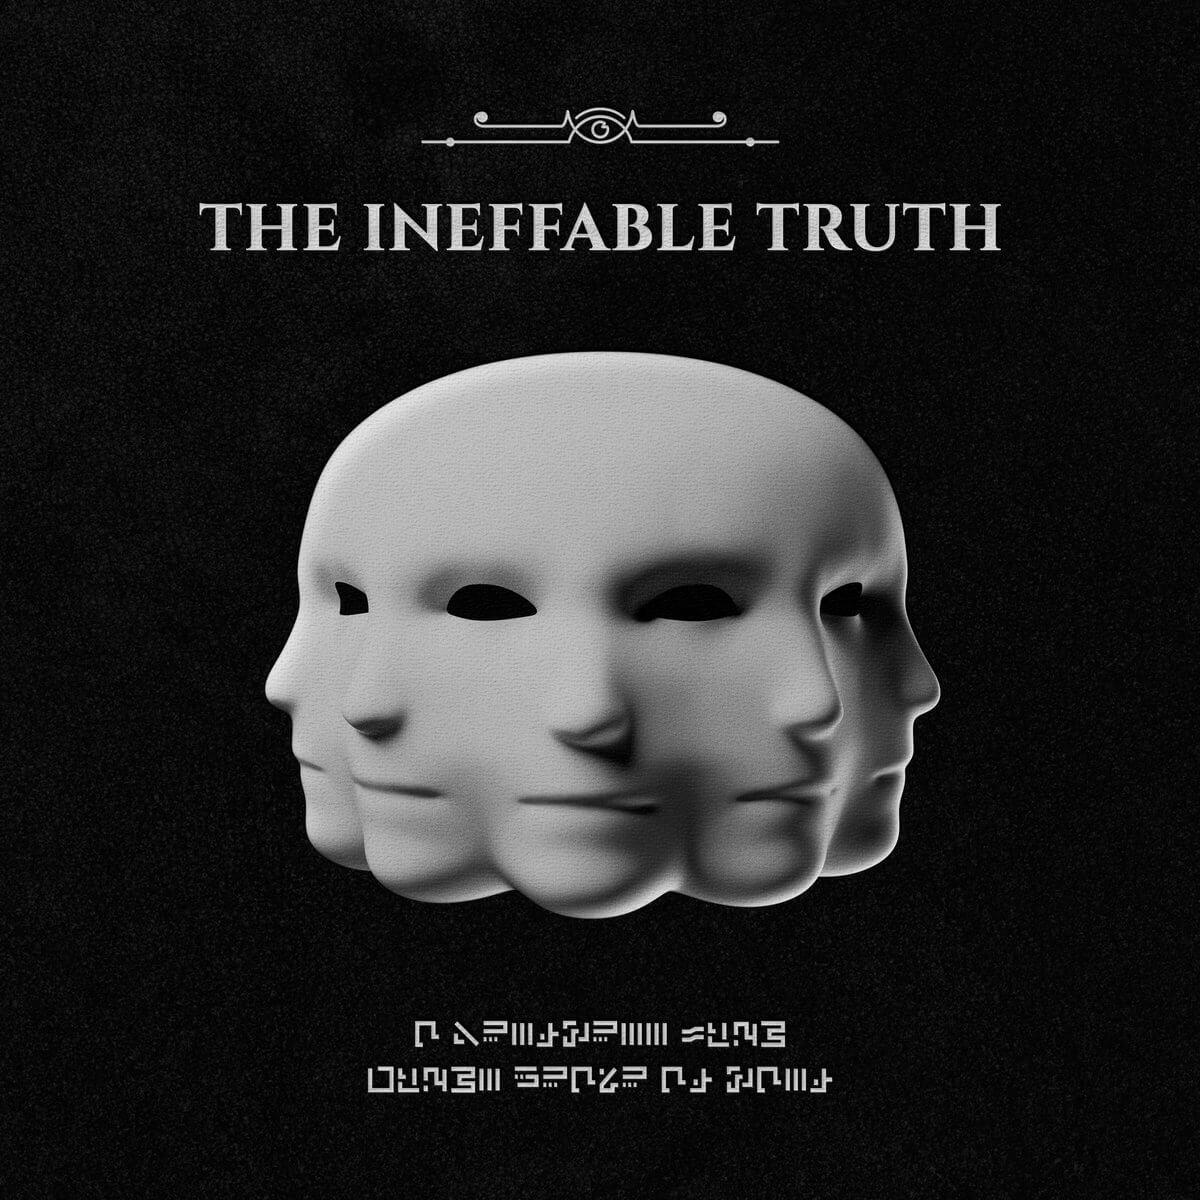 G Jones The Ineffable Truth